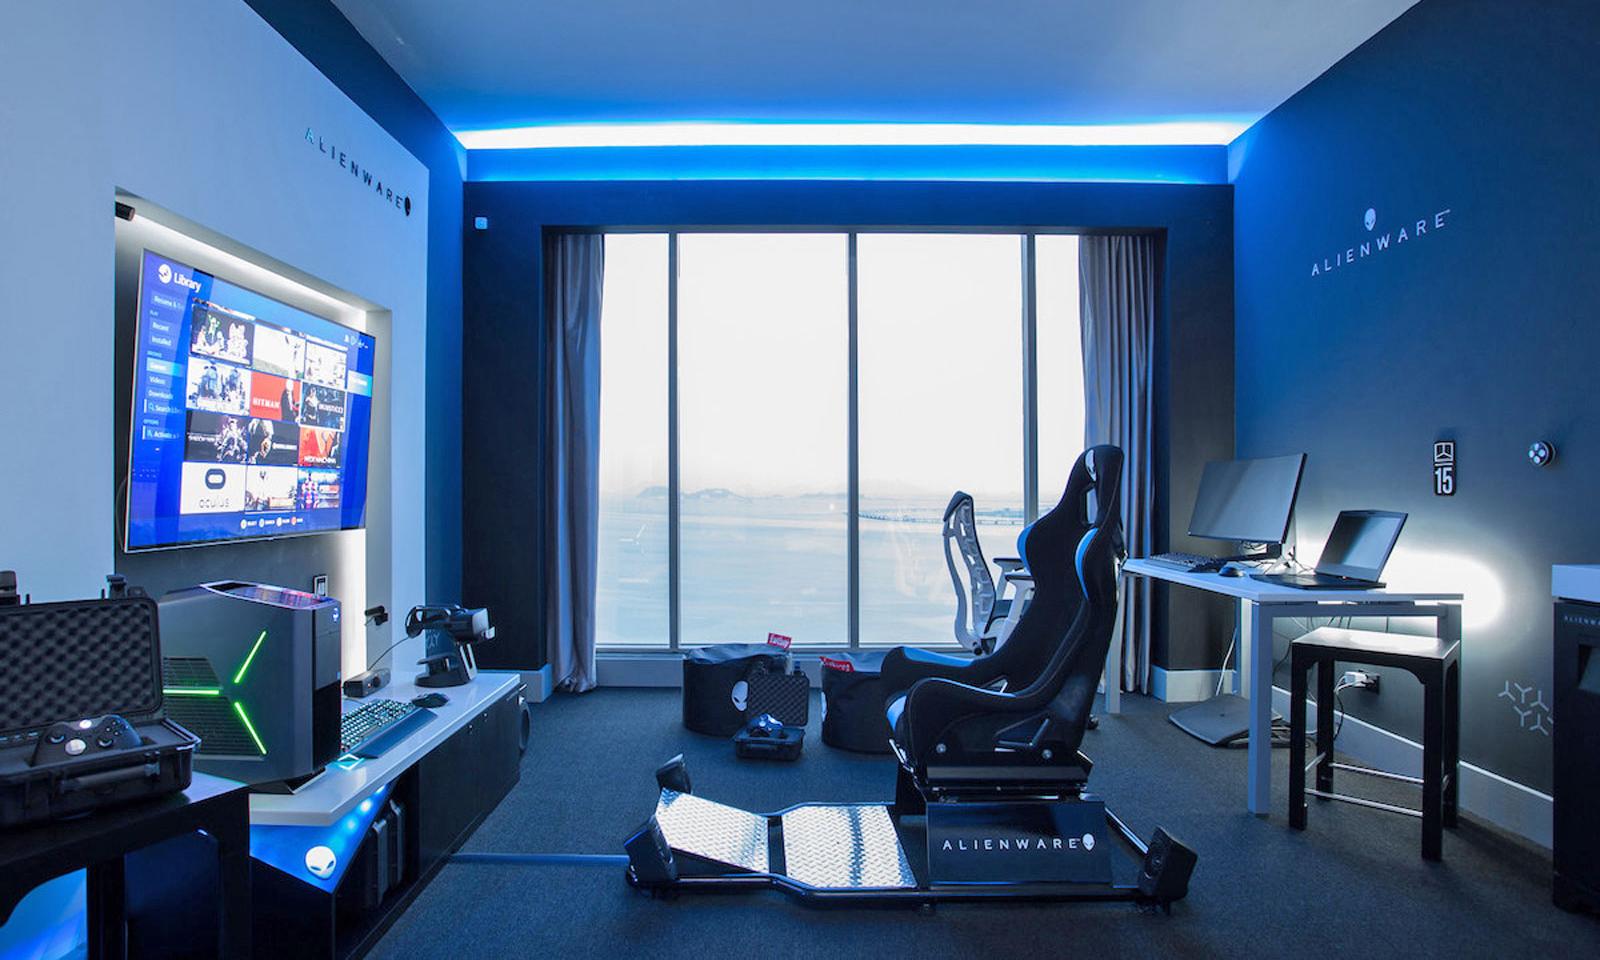 Hilton 酒店携手 ALIENWARE 打造电竞主题套房